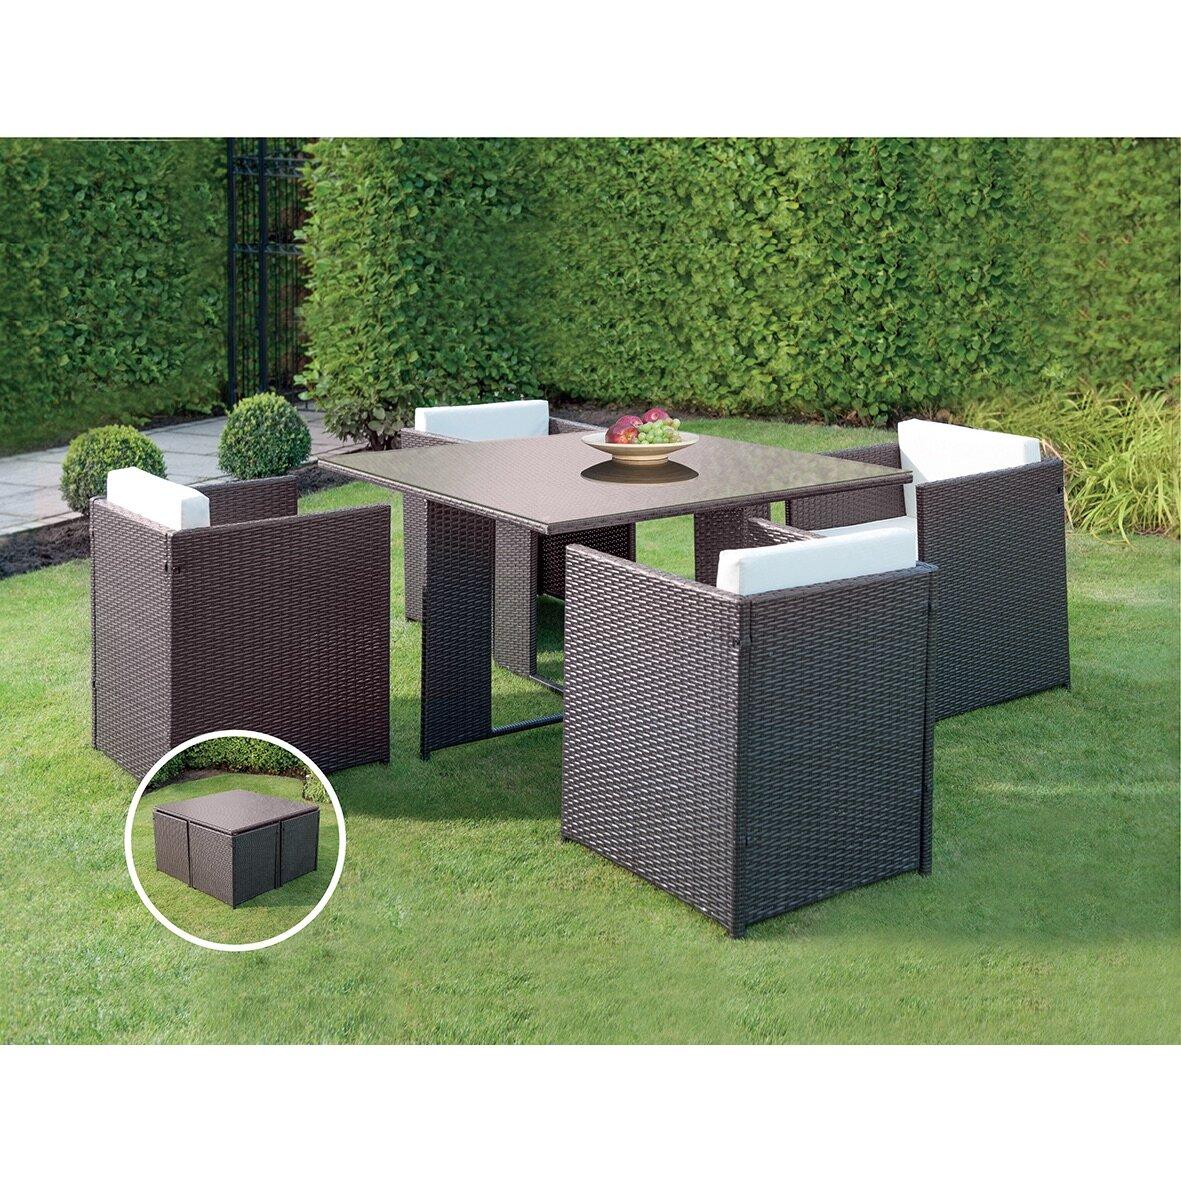 JB Patio Patio Wicker Outdoor 5 Piece Dining Set IFIN 5 piece patio set  Patio Wicker. patio ideas   Insightfulness 5 Piece Patio Set Lowes Garden